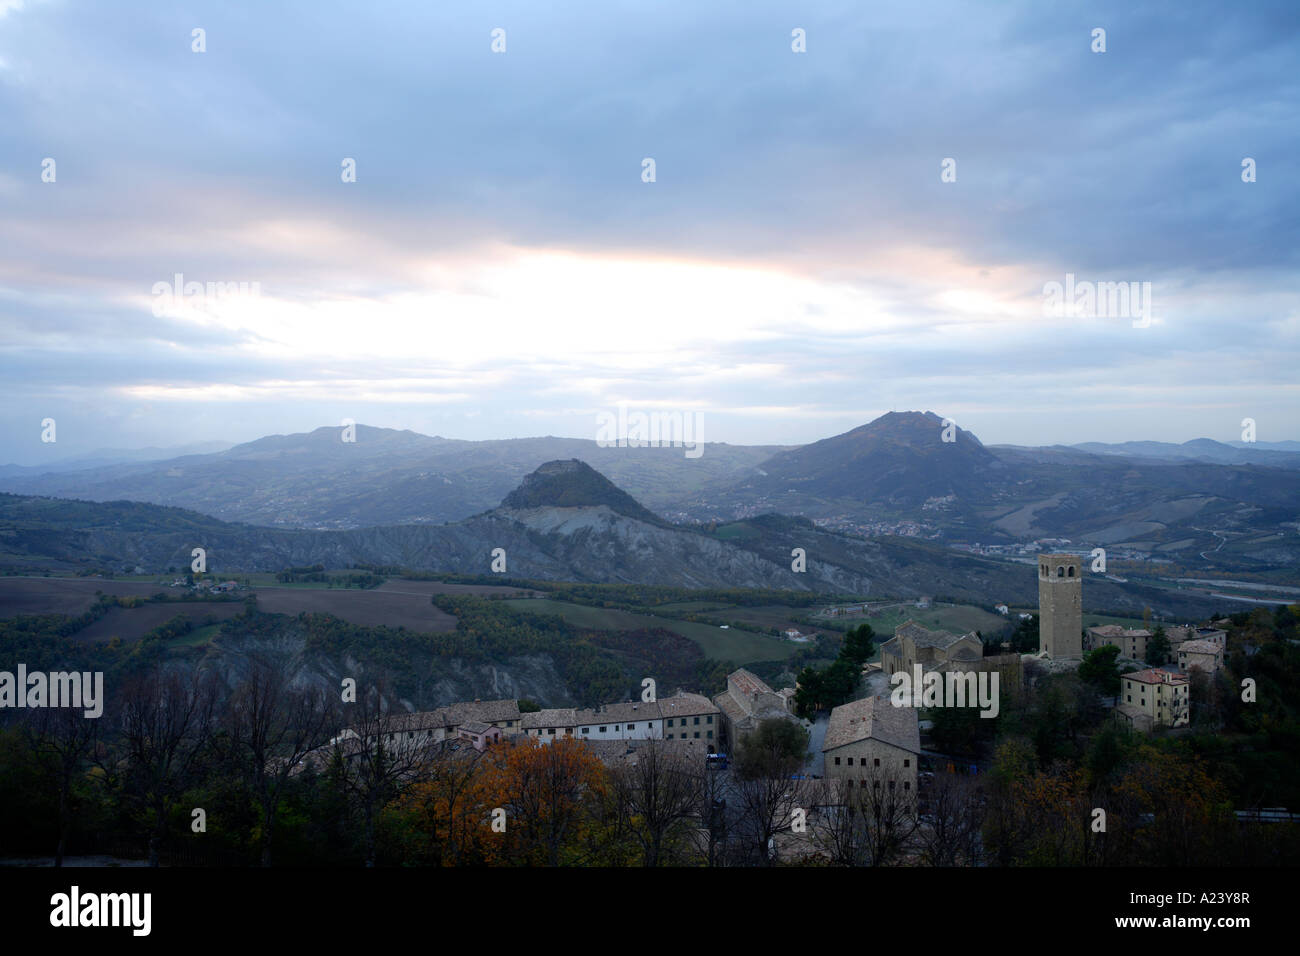 View from Basilica del Santo, San Marino, Emilia-Romagna, Italy. - Stock Image